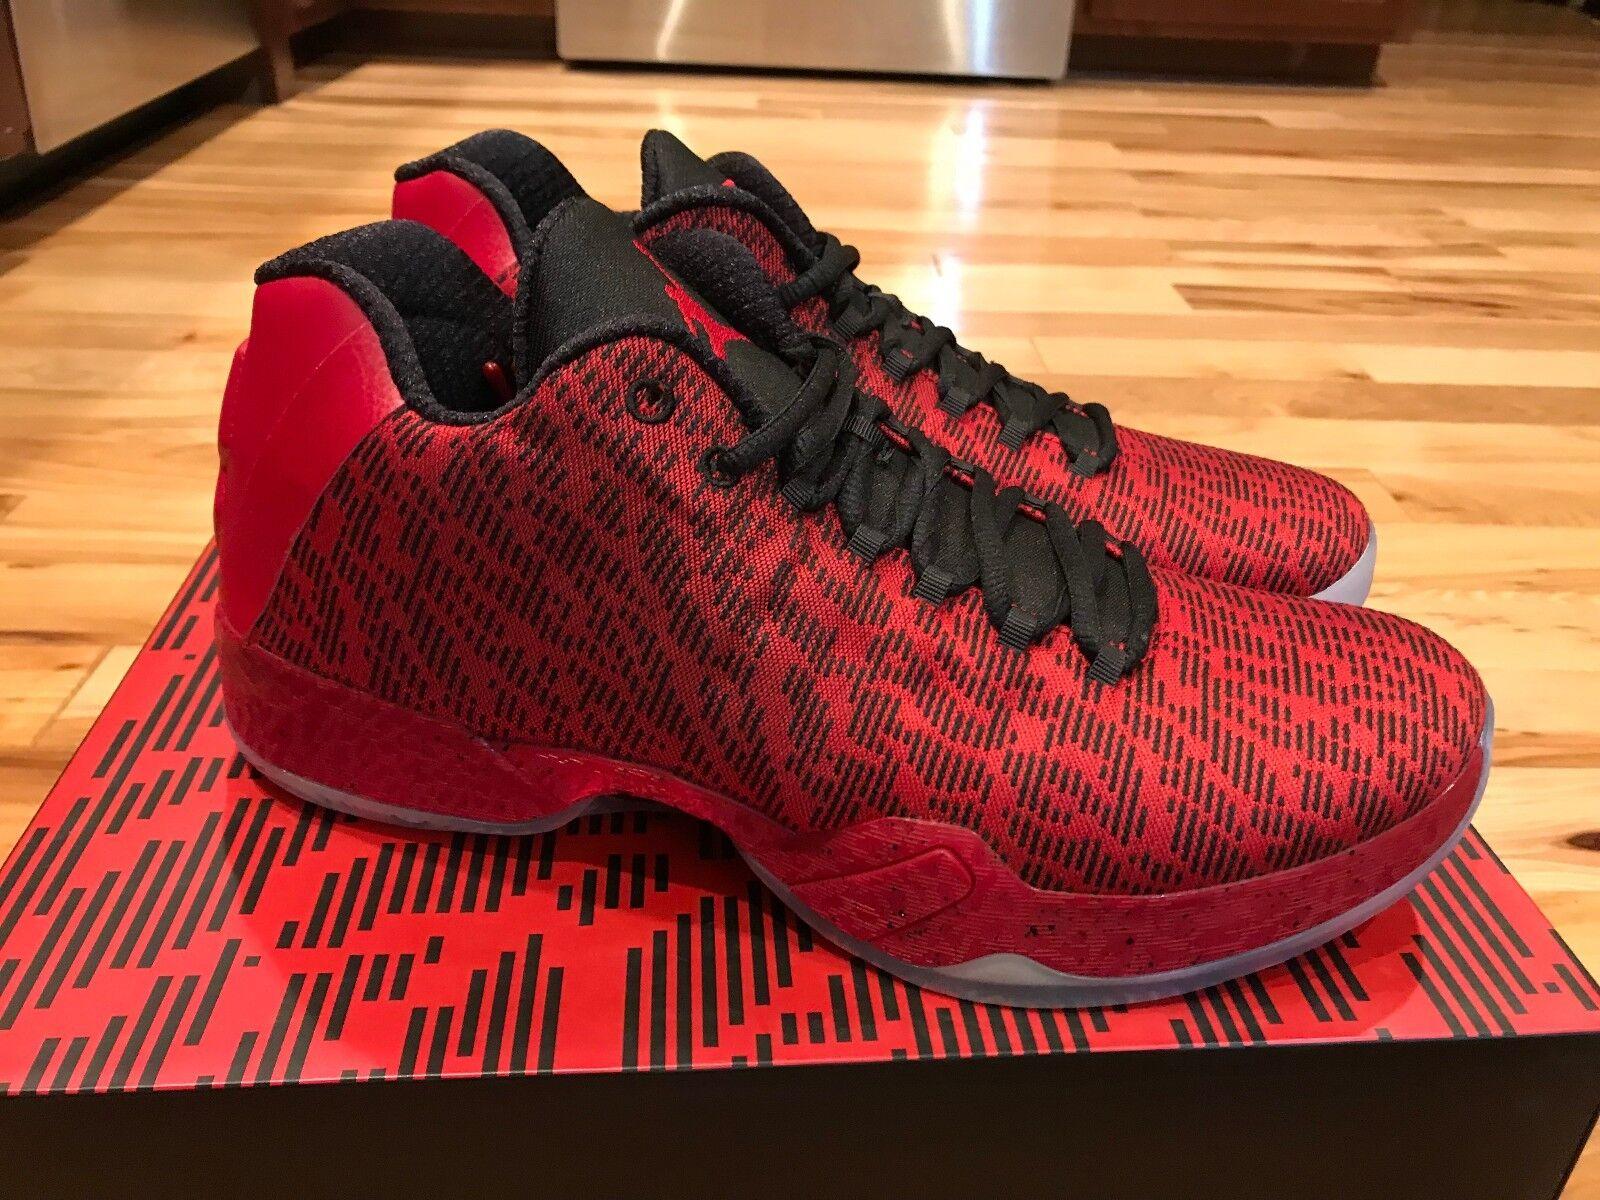 Nike Air Jordan 29 XX9 Low Jimmy Butler PE Gym Red/Black 855514-605 Size 11